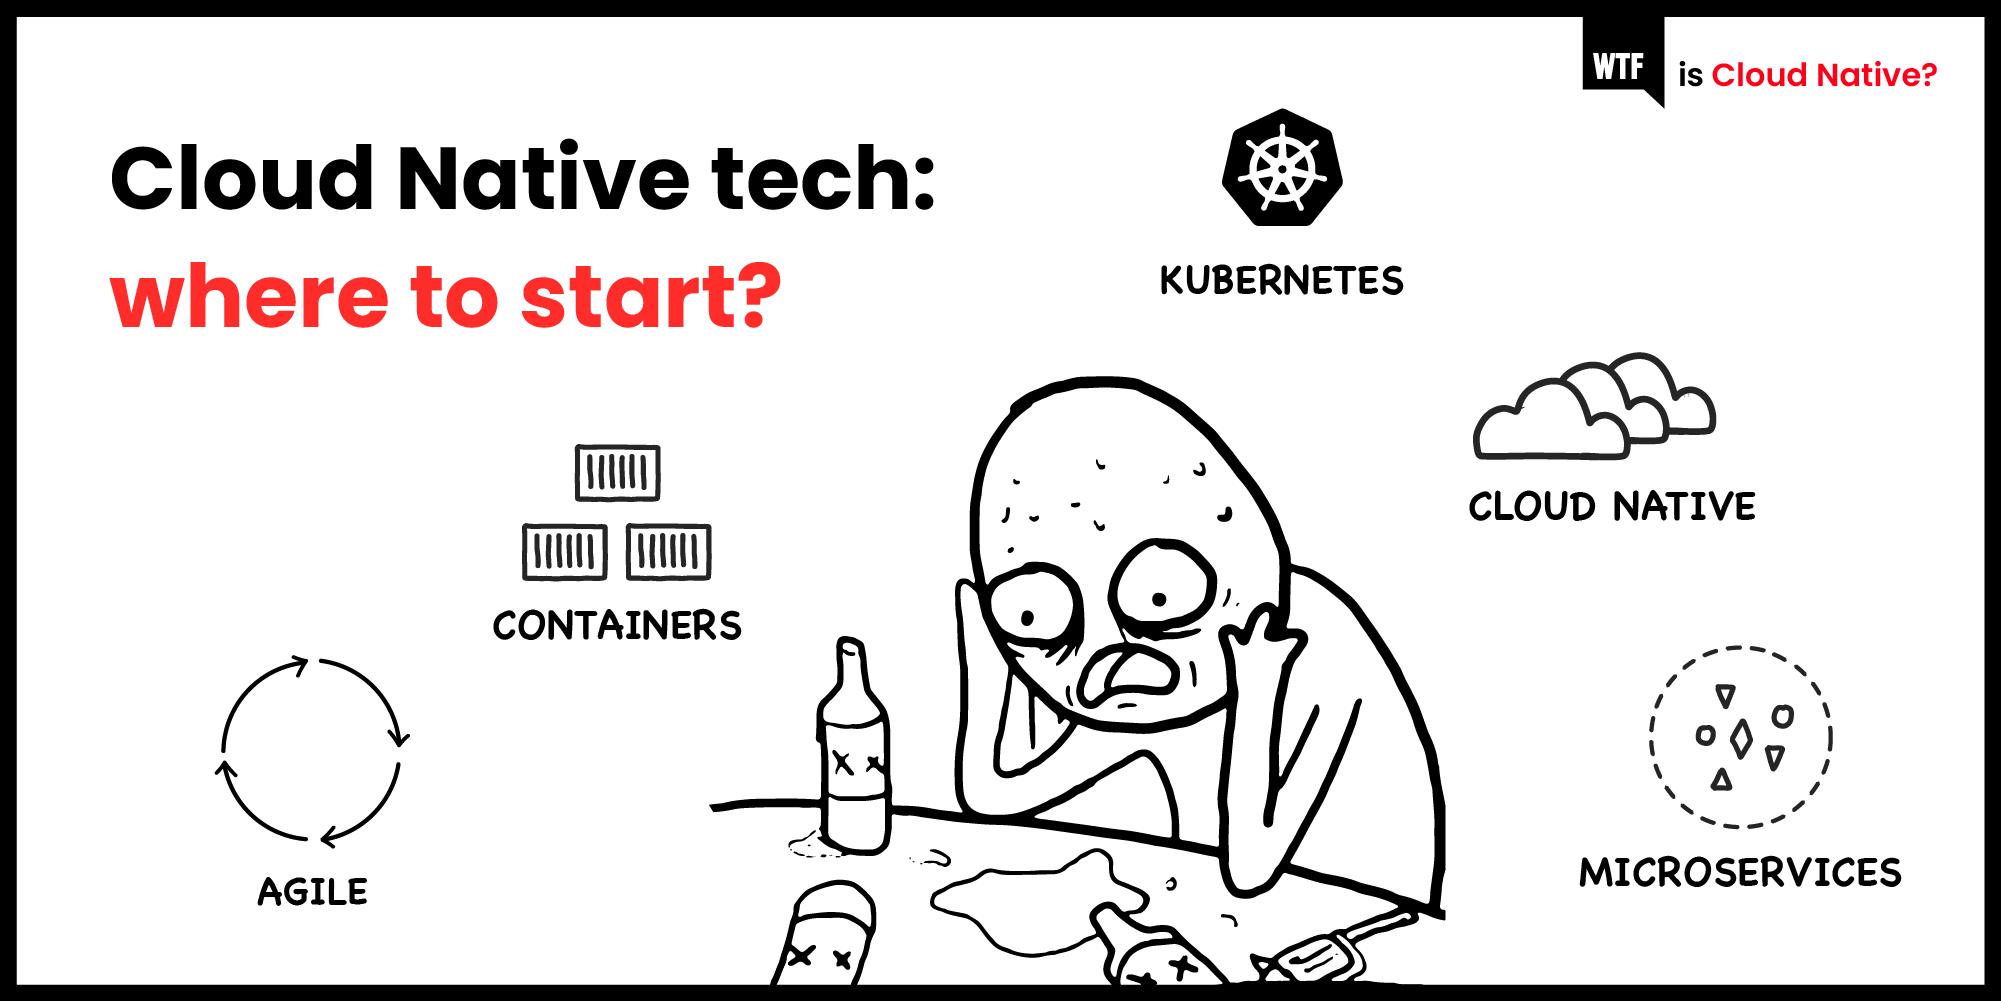 CN_tech_where_to_start.png